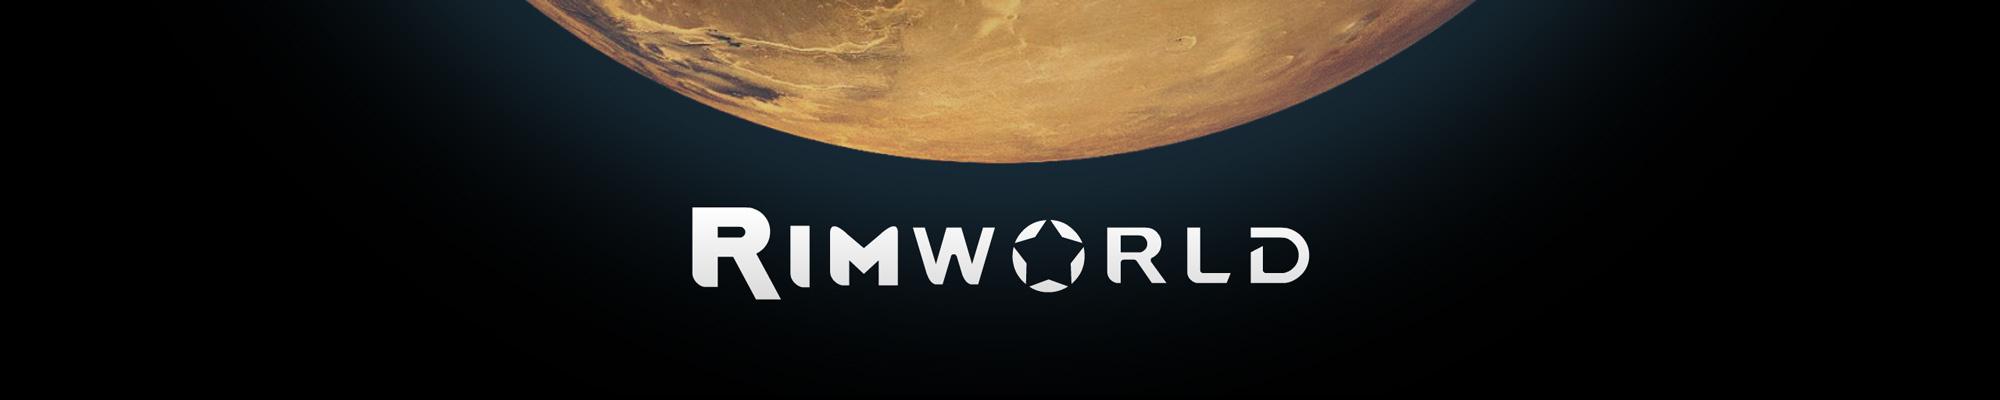 Rimworld:最有趣的事情莫过于瞎操心